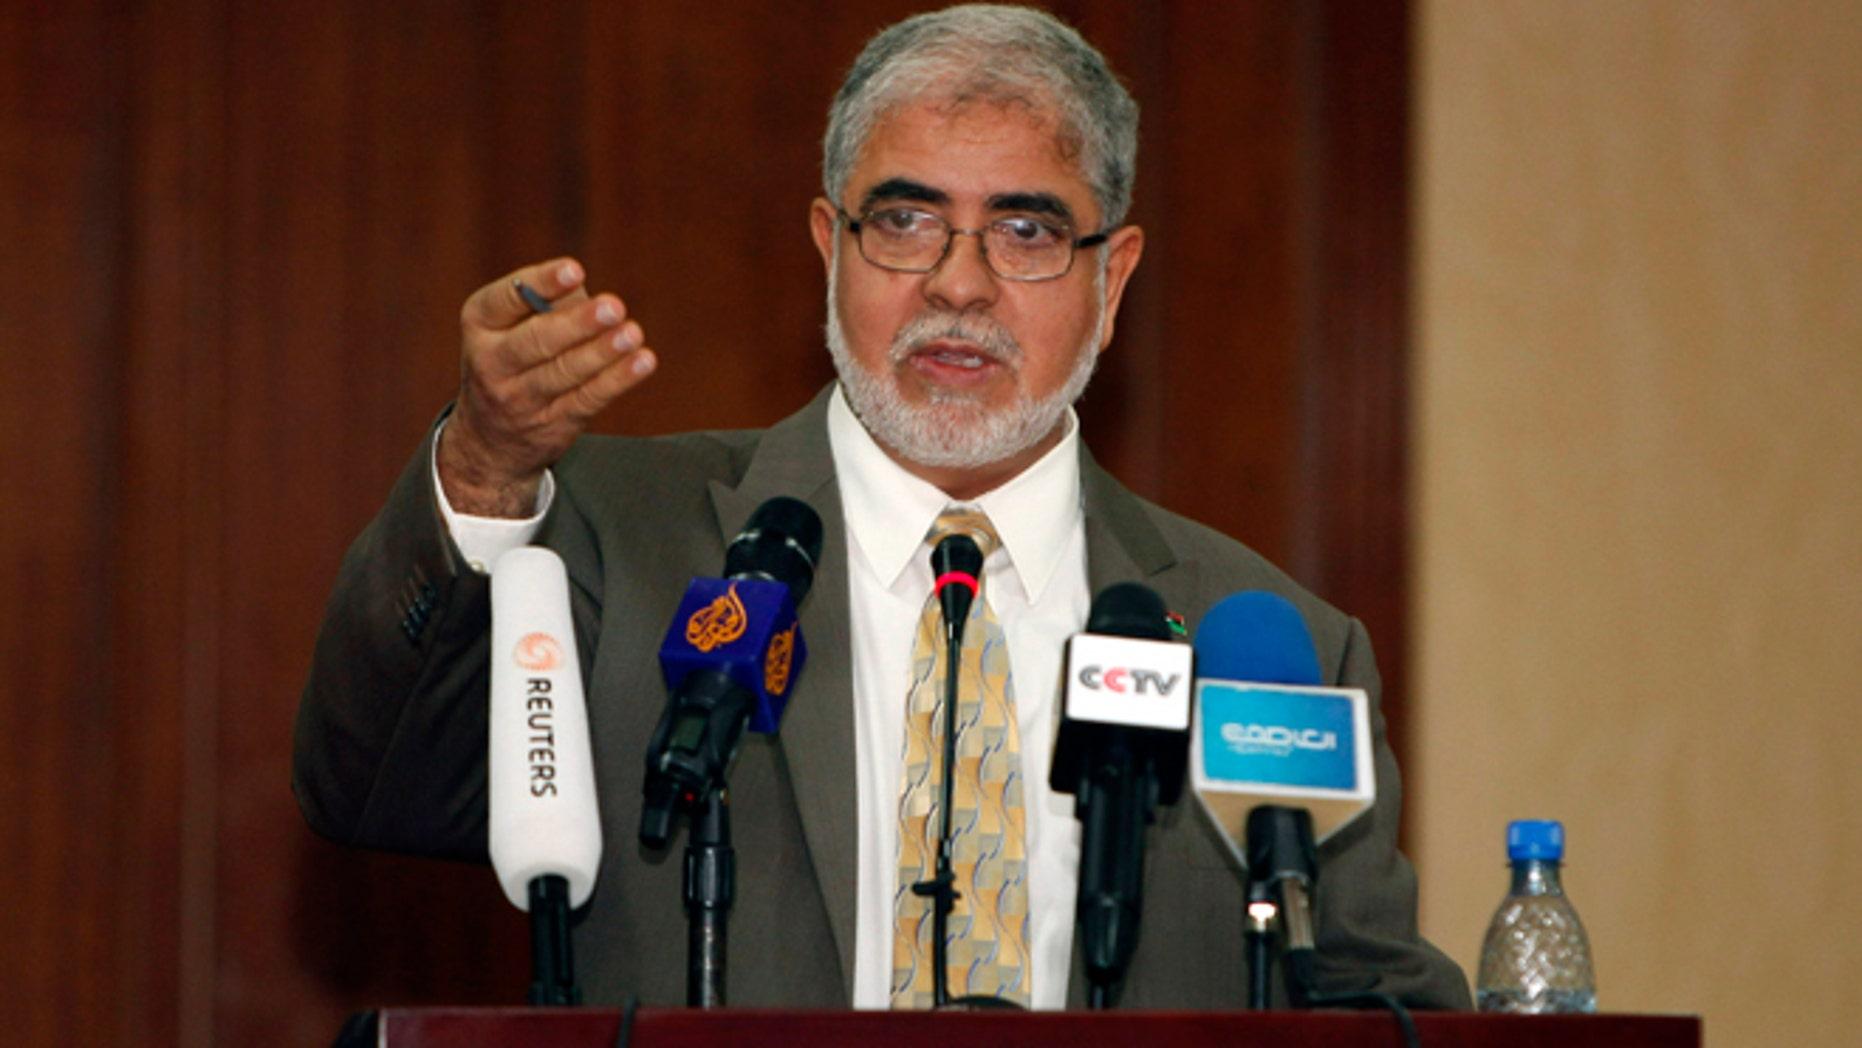 Dec. 4, 2011: Libya's Deputy Prime Minister Mustafa Abushagur speaks at a news conference in Tripoli.